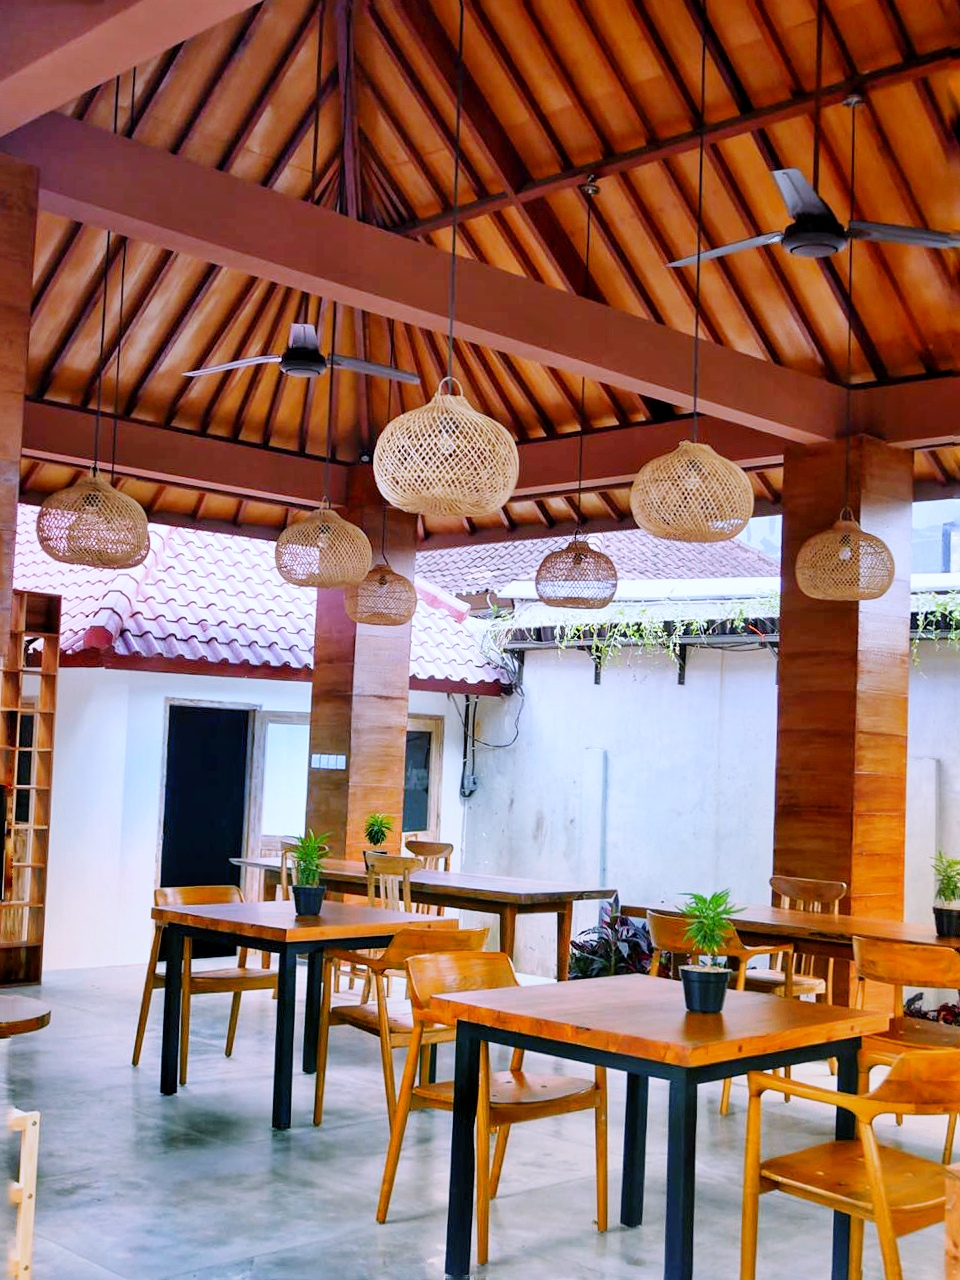 Biliq Bali Cosharing Space, Bali